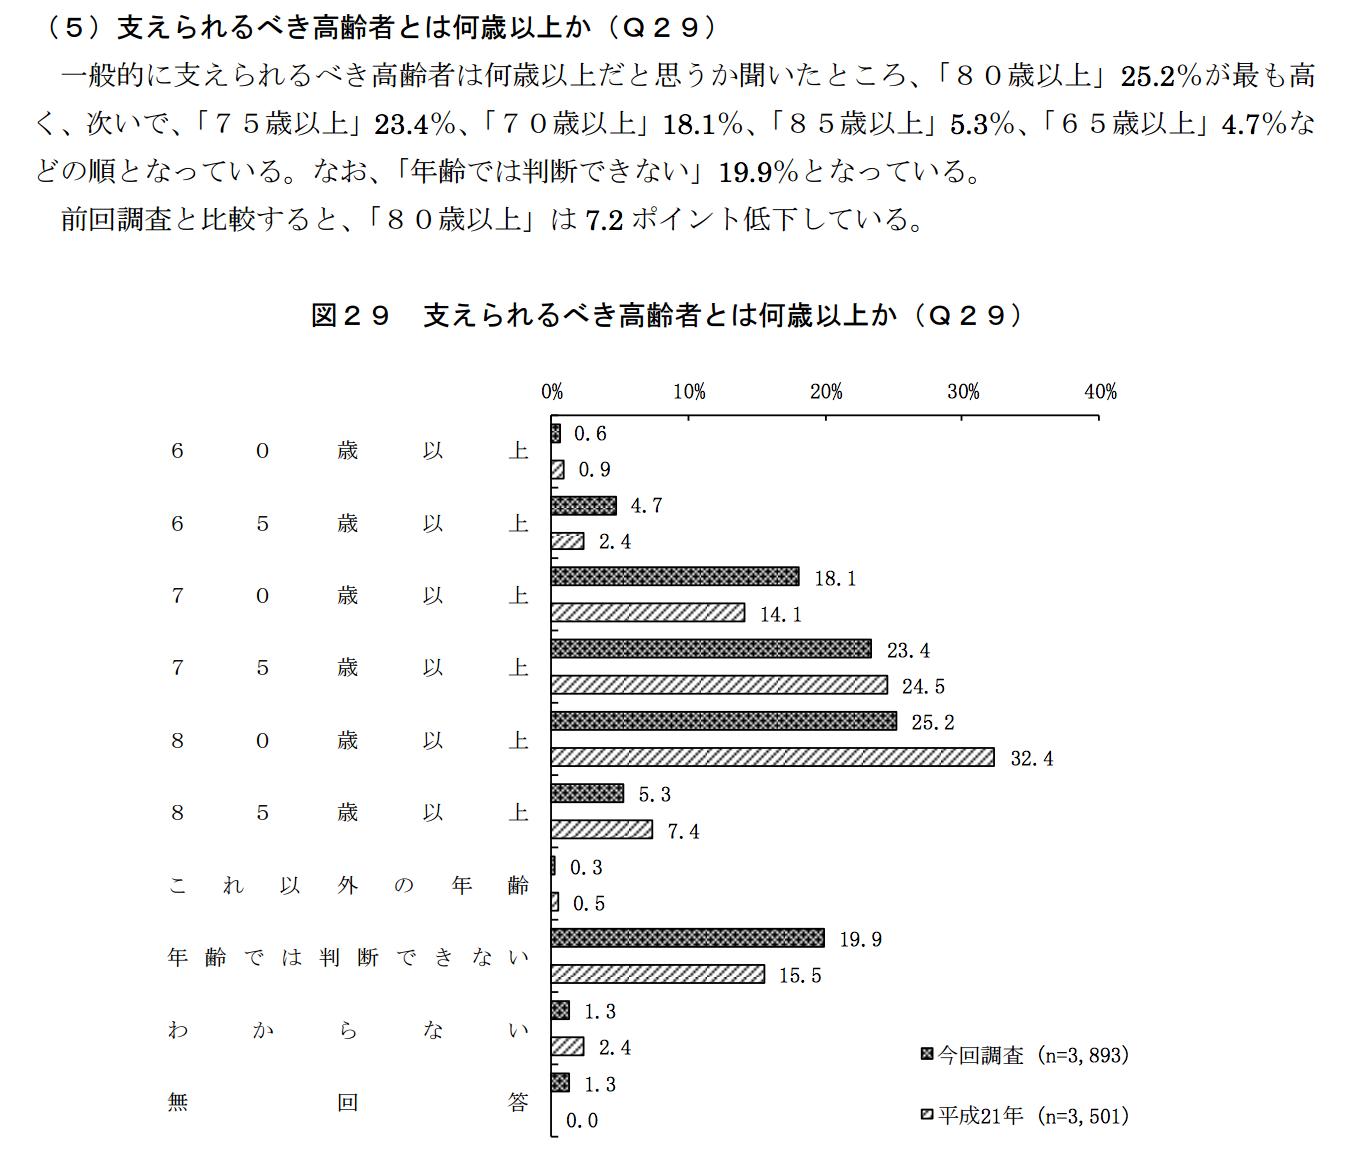 %e3%82%b9%e3%82%af%e3%83%aa%e3%83%bc%e3%83%b3%e3%82%b7%e3%83%a7%e3%83%83%e3%83%88-2016-12-31-00-21-48